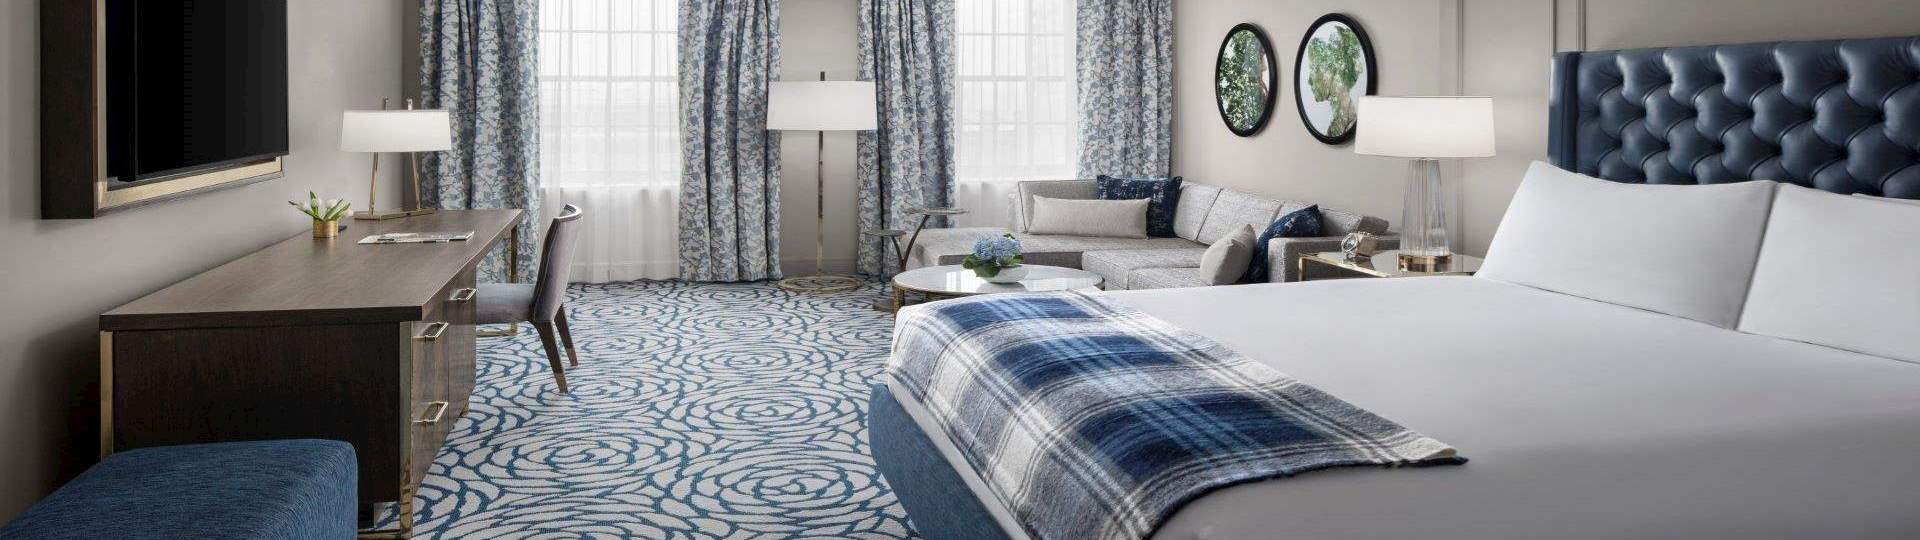 Guest Rooms in Lytle Park Historic District, Cincinnati